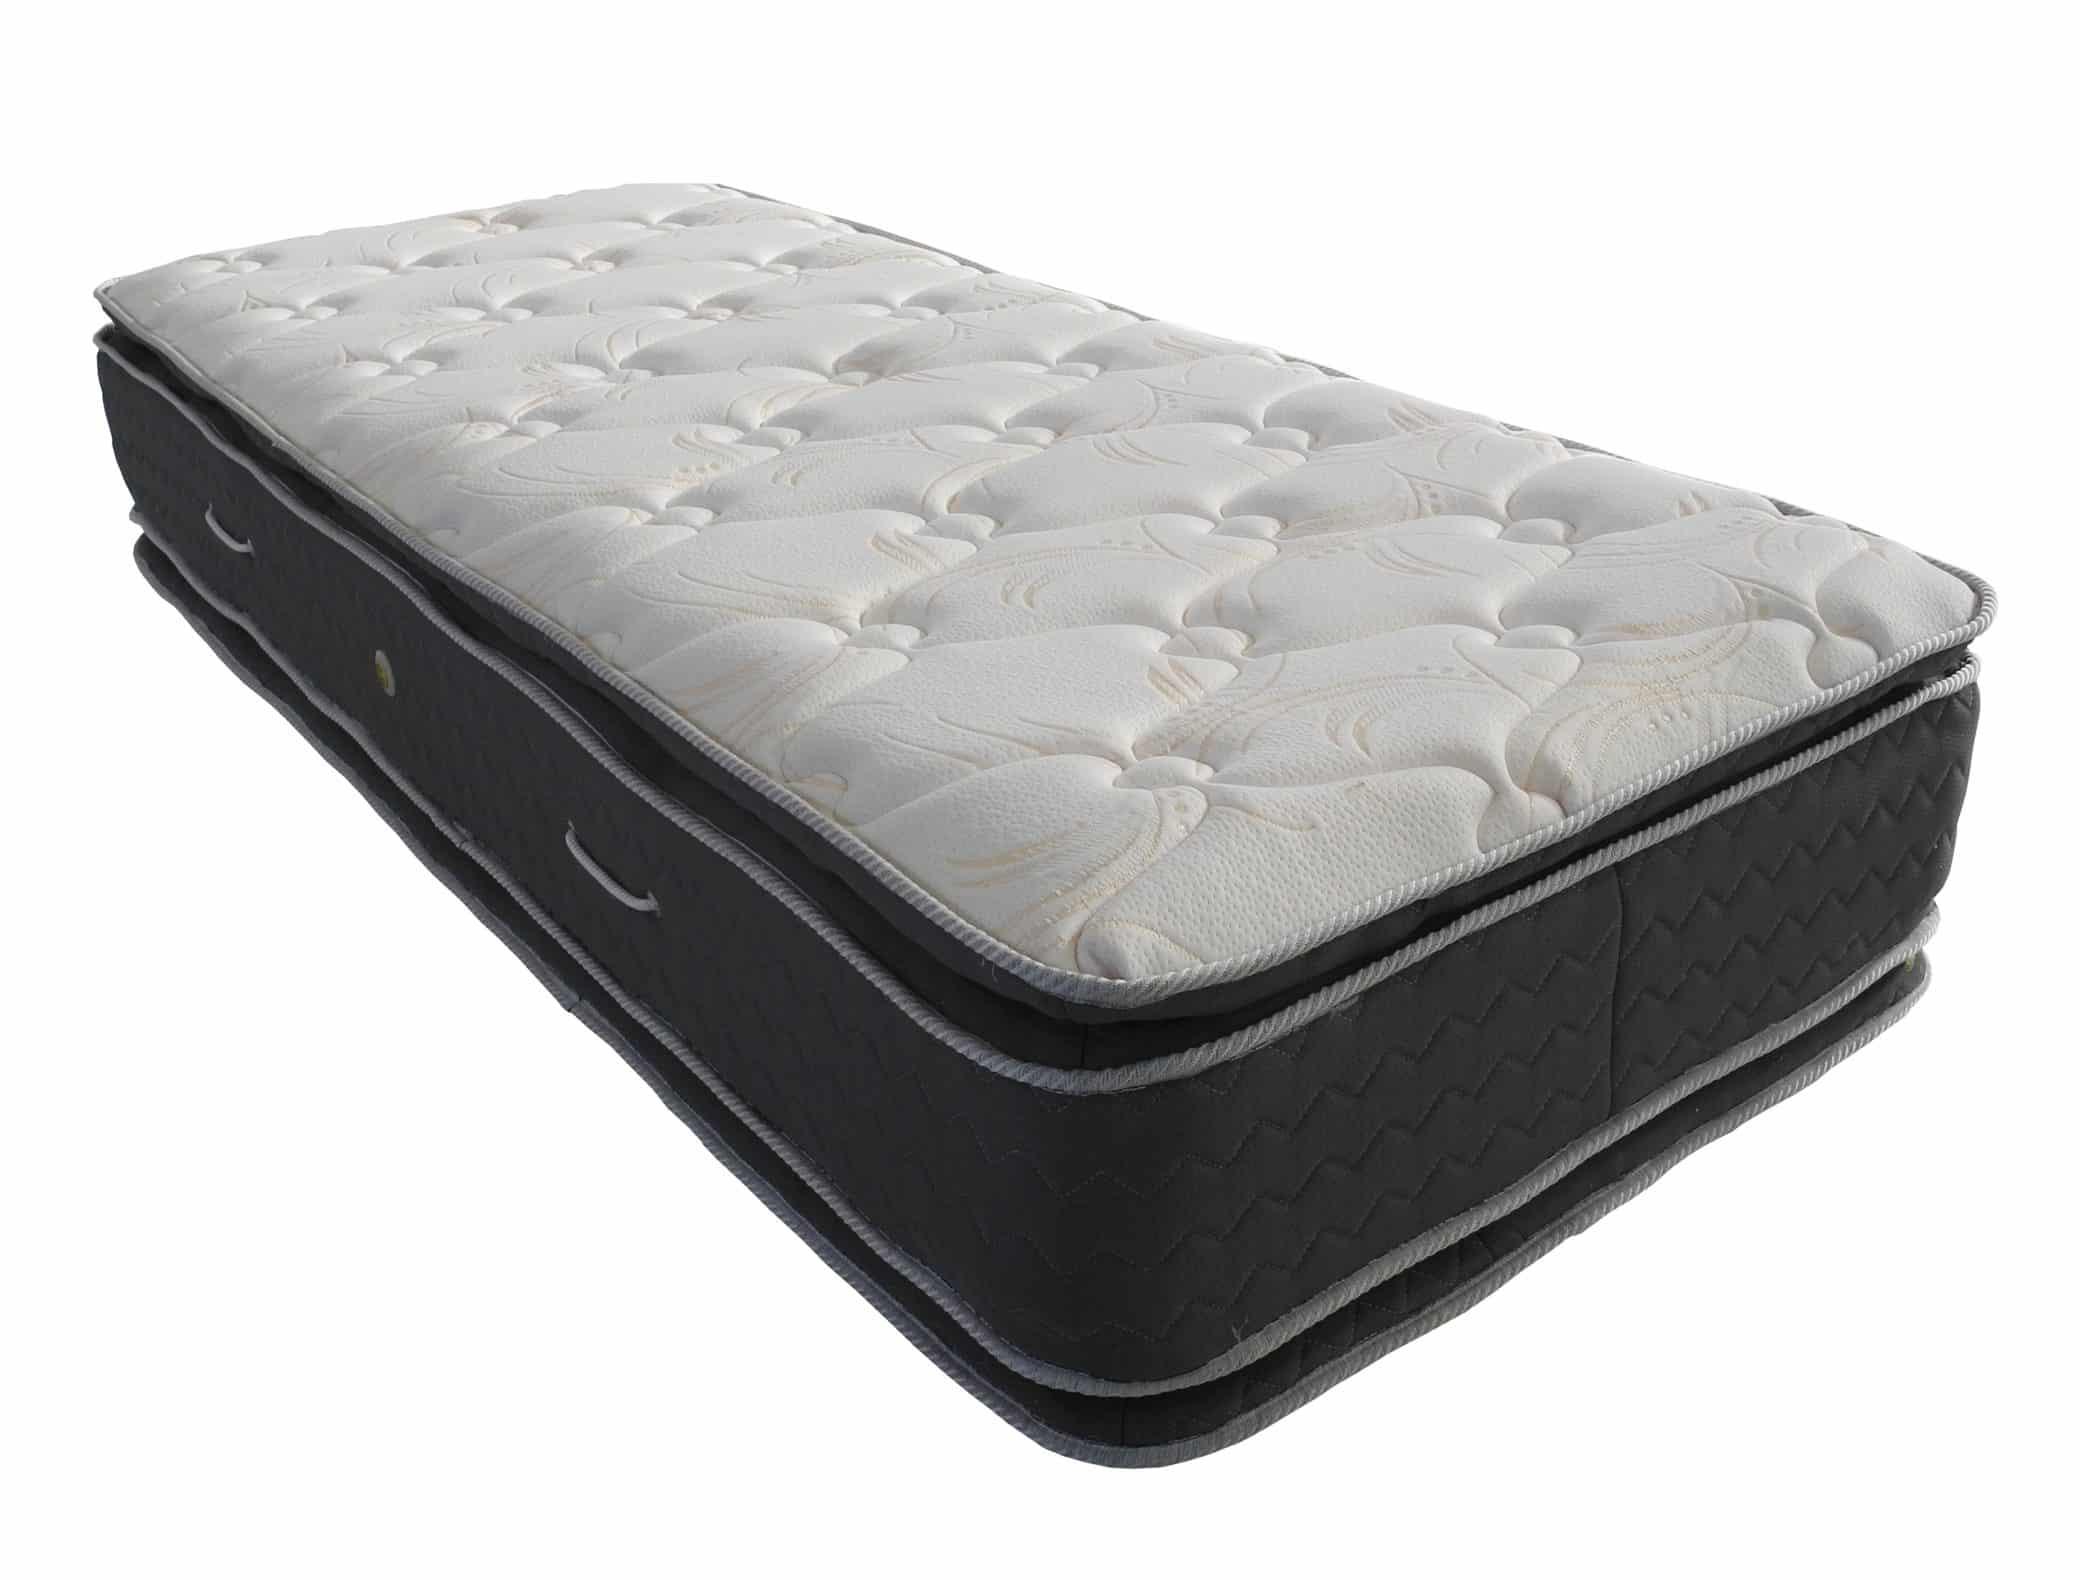 Colch n resortes pacific con doble pillow 190x130 arcoiris - Colchon tatami ...